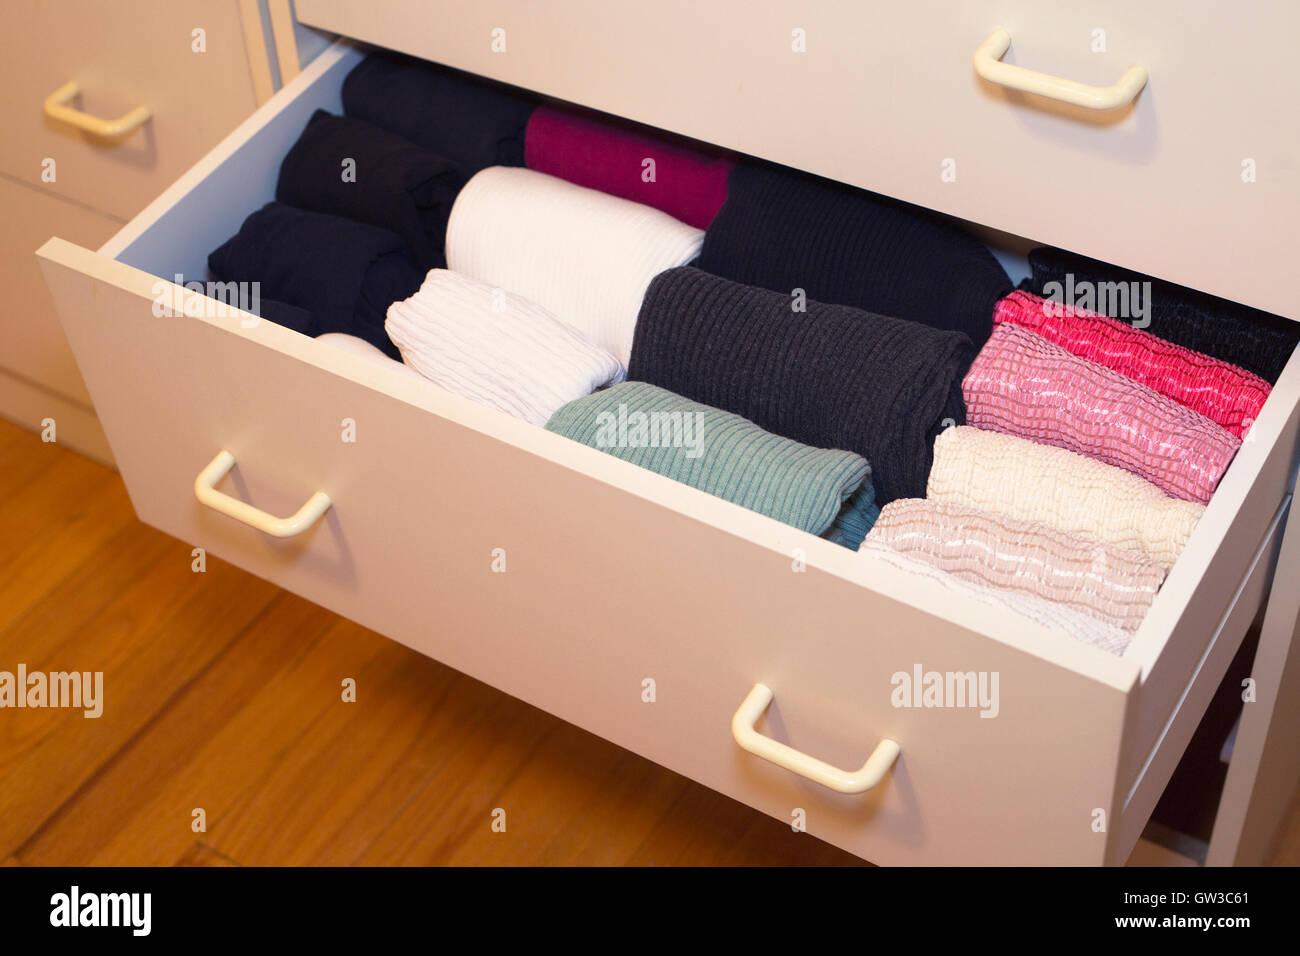 Woman's shirts in a bureau drawer folded in the KonMari method of home organization expert Marie Kondo. - Stock Image